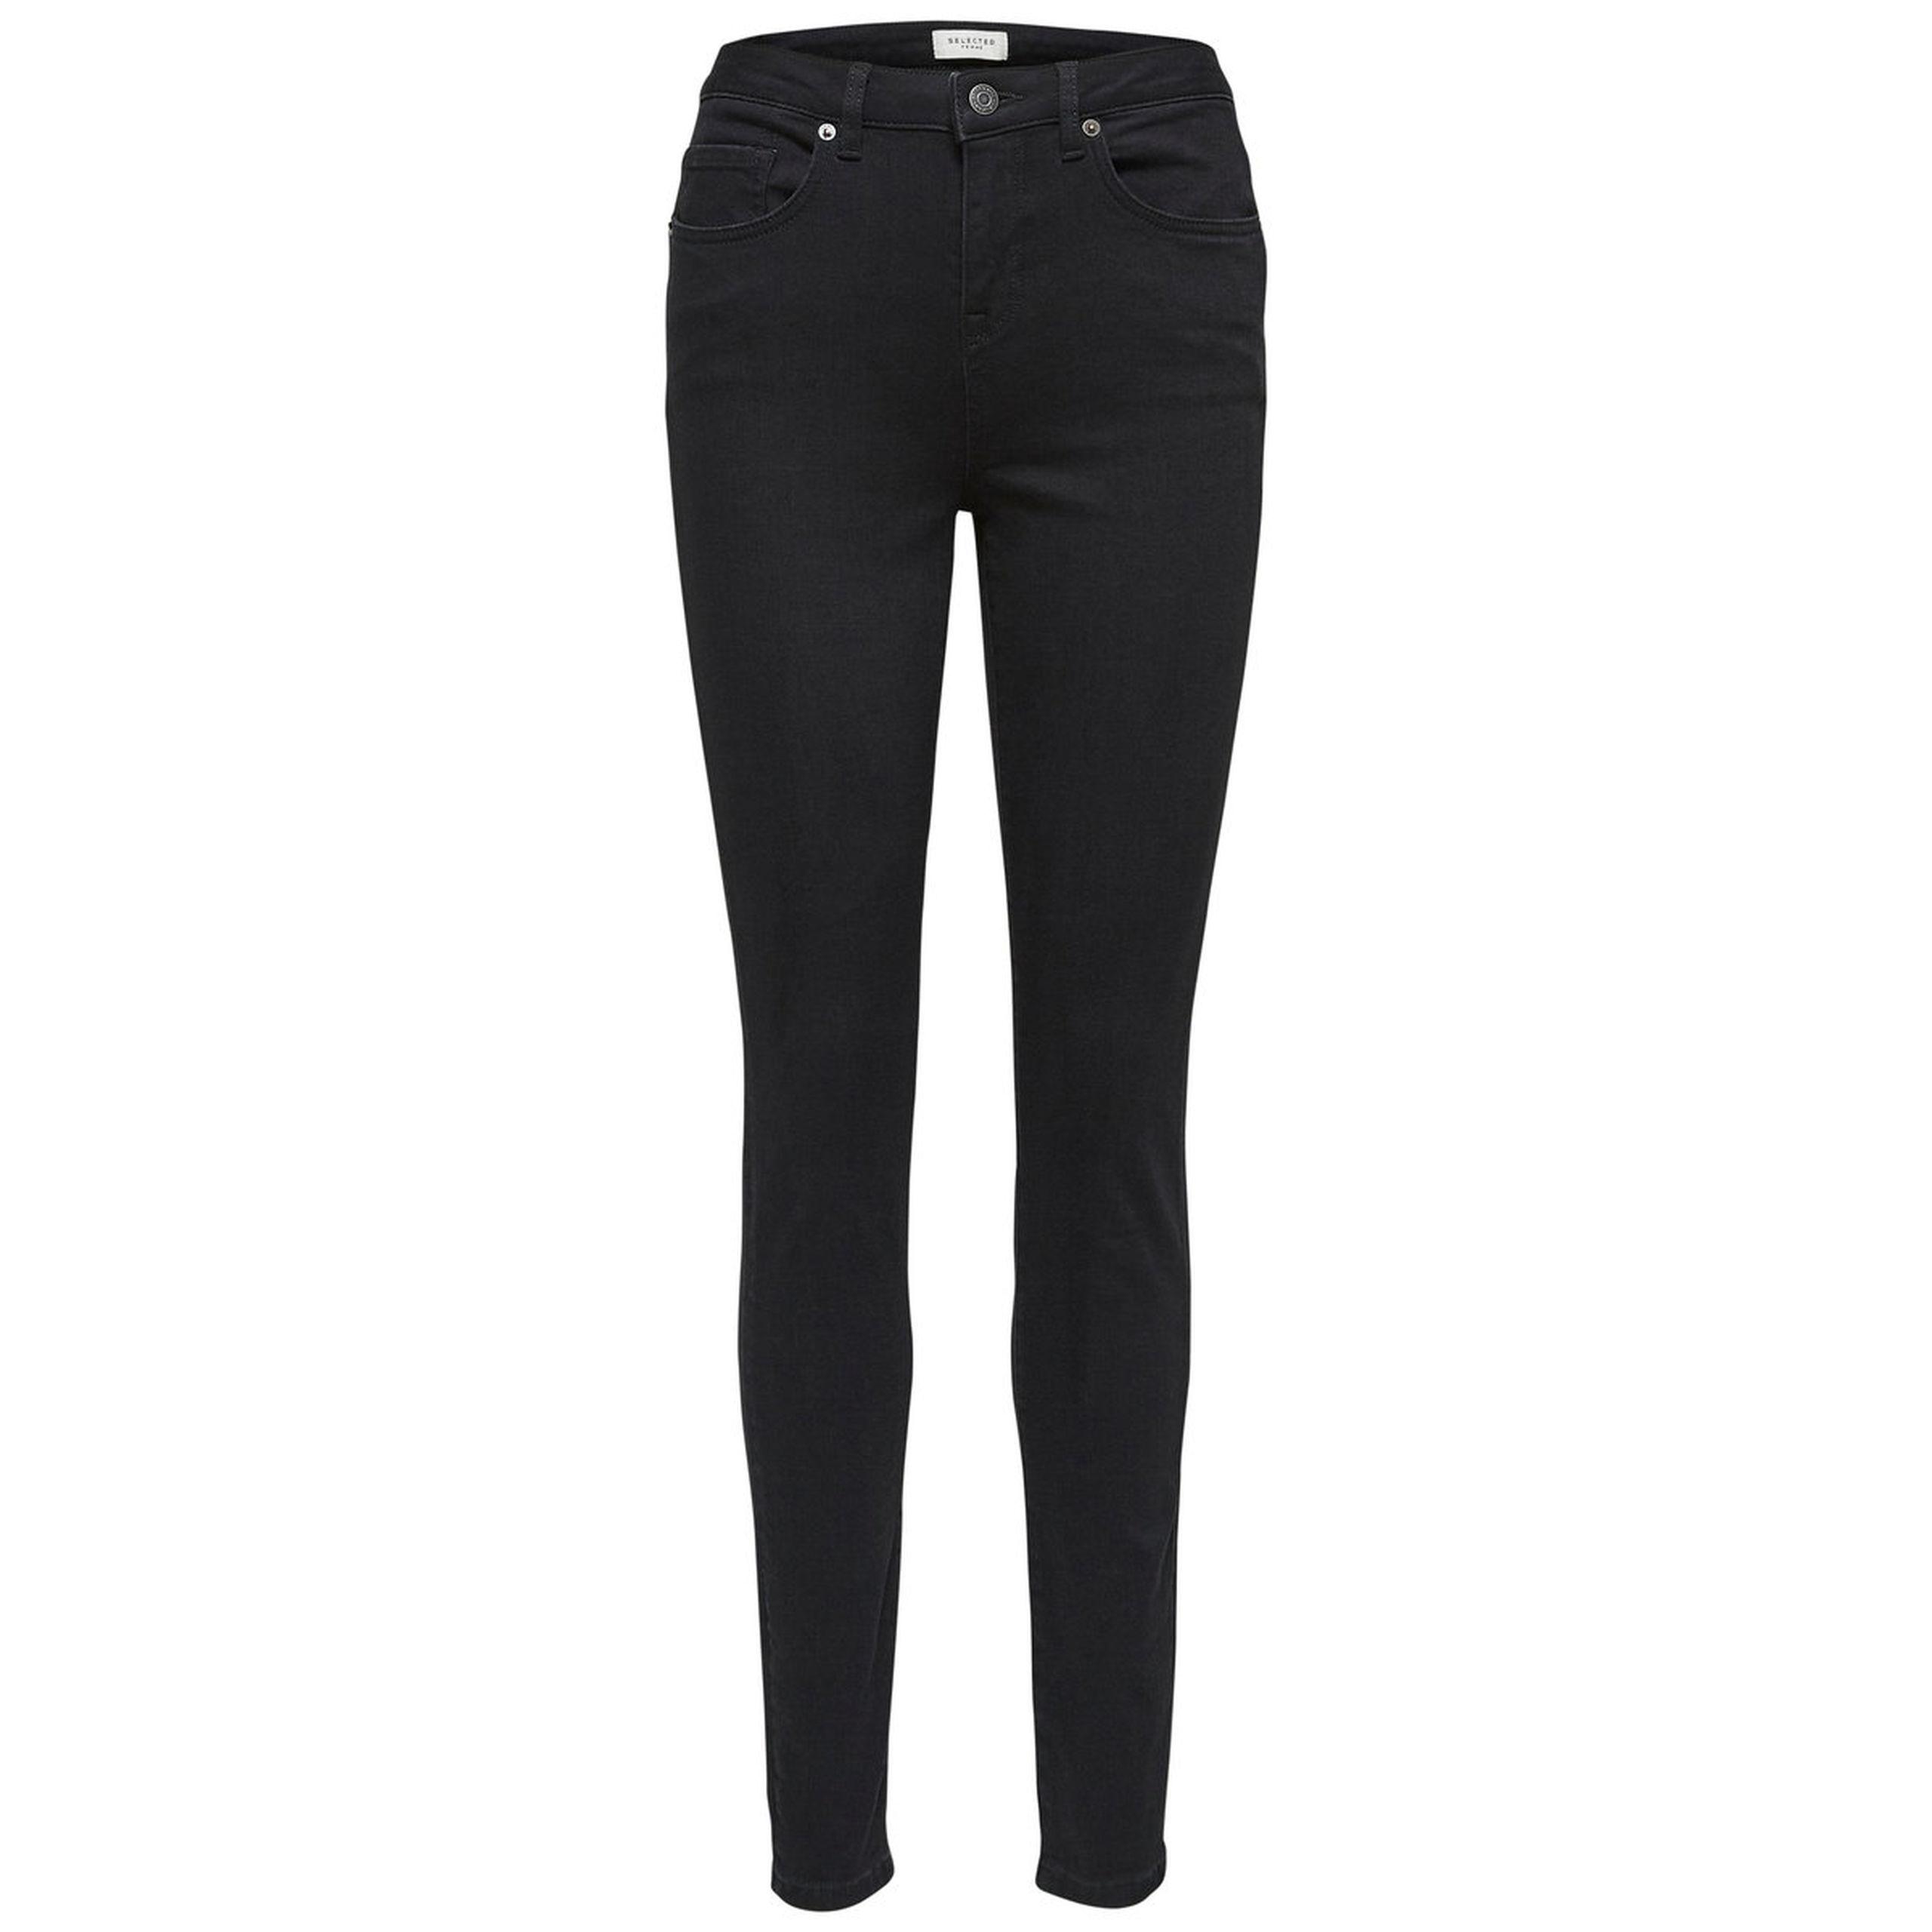 Maggie High Waist Black Skinny Jeans